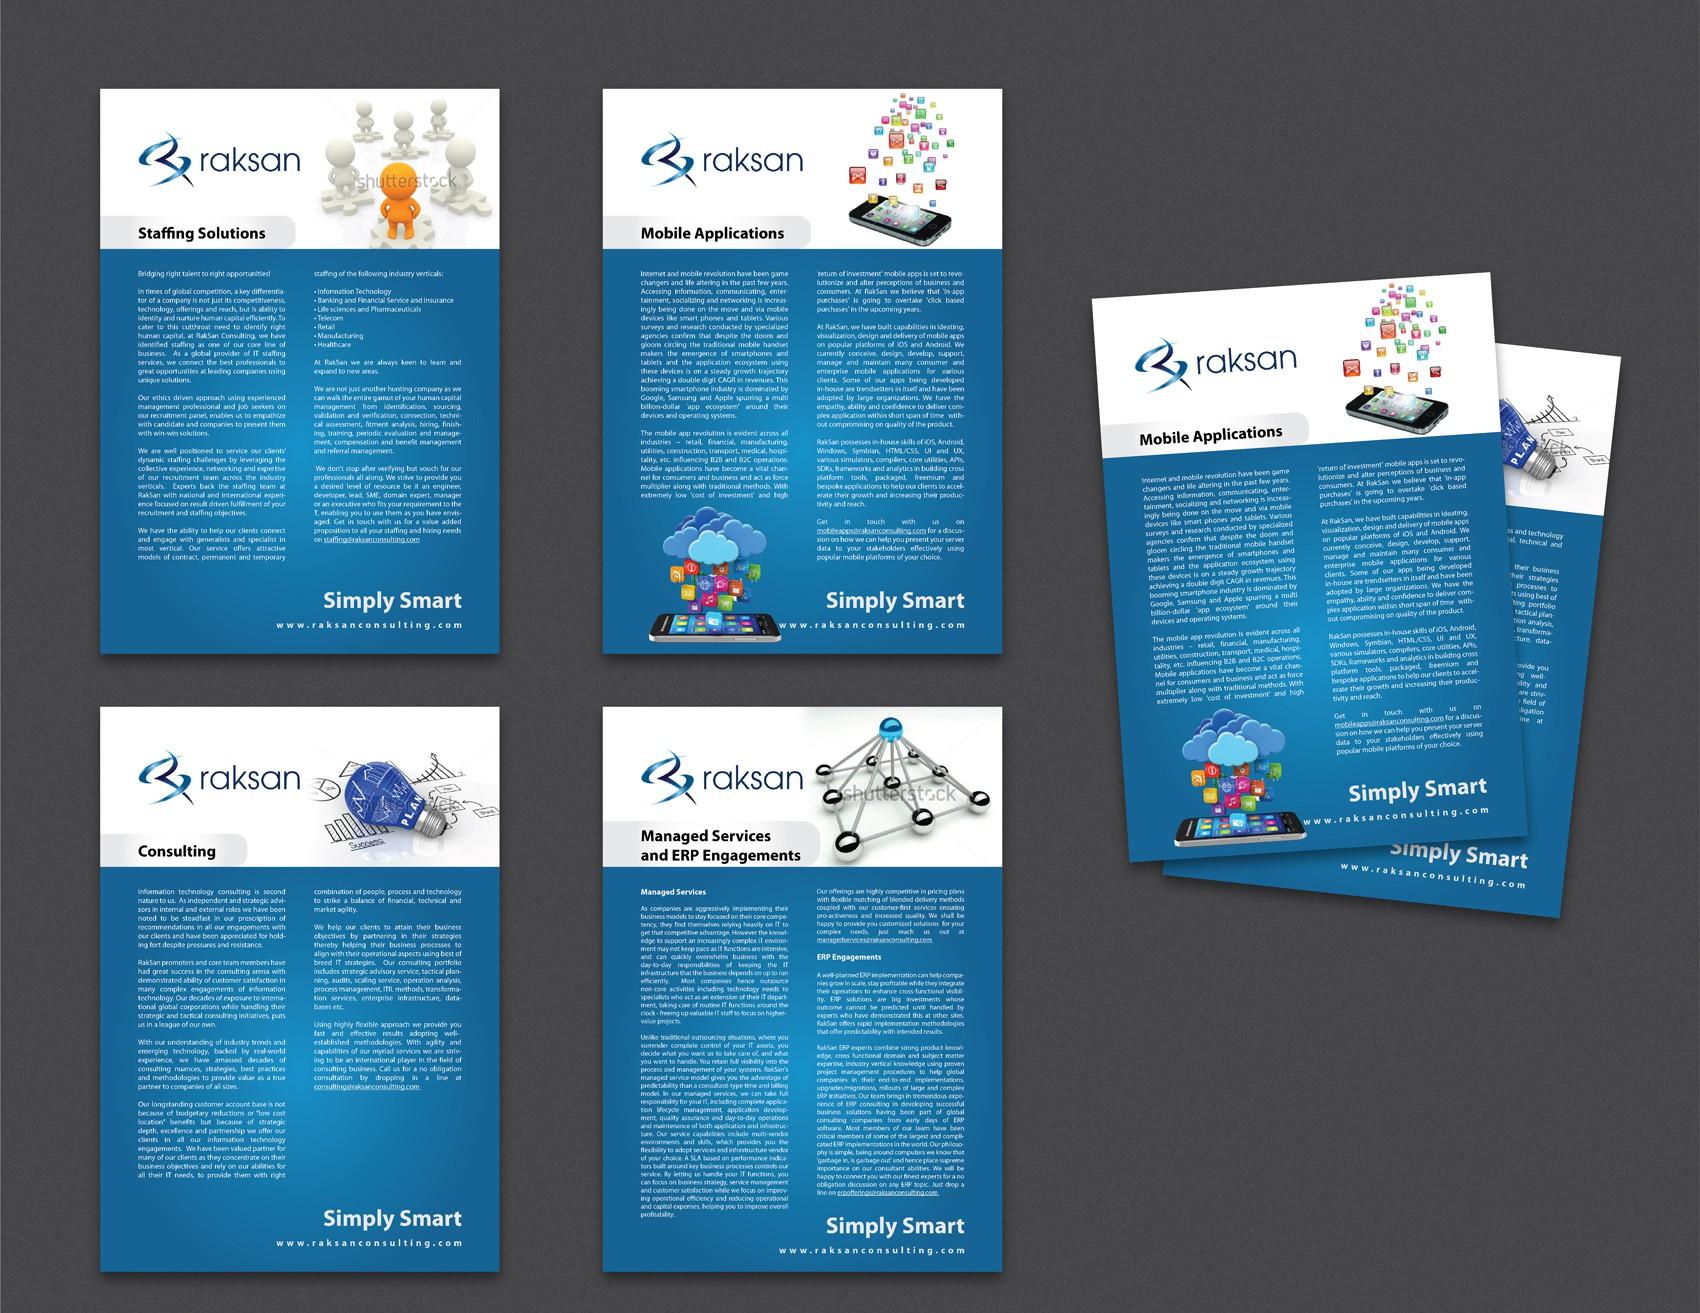 Raksan Consulting needs a new brochure design